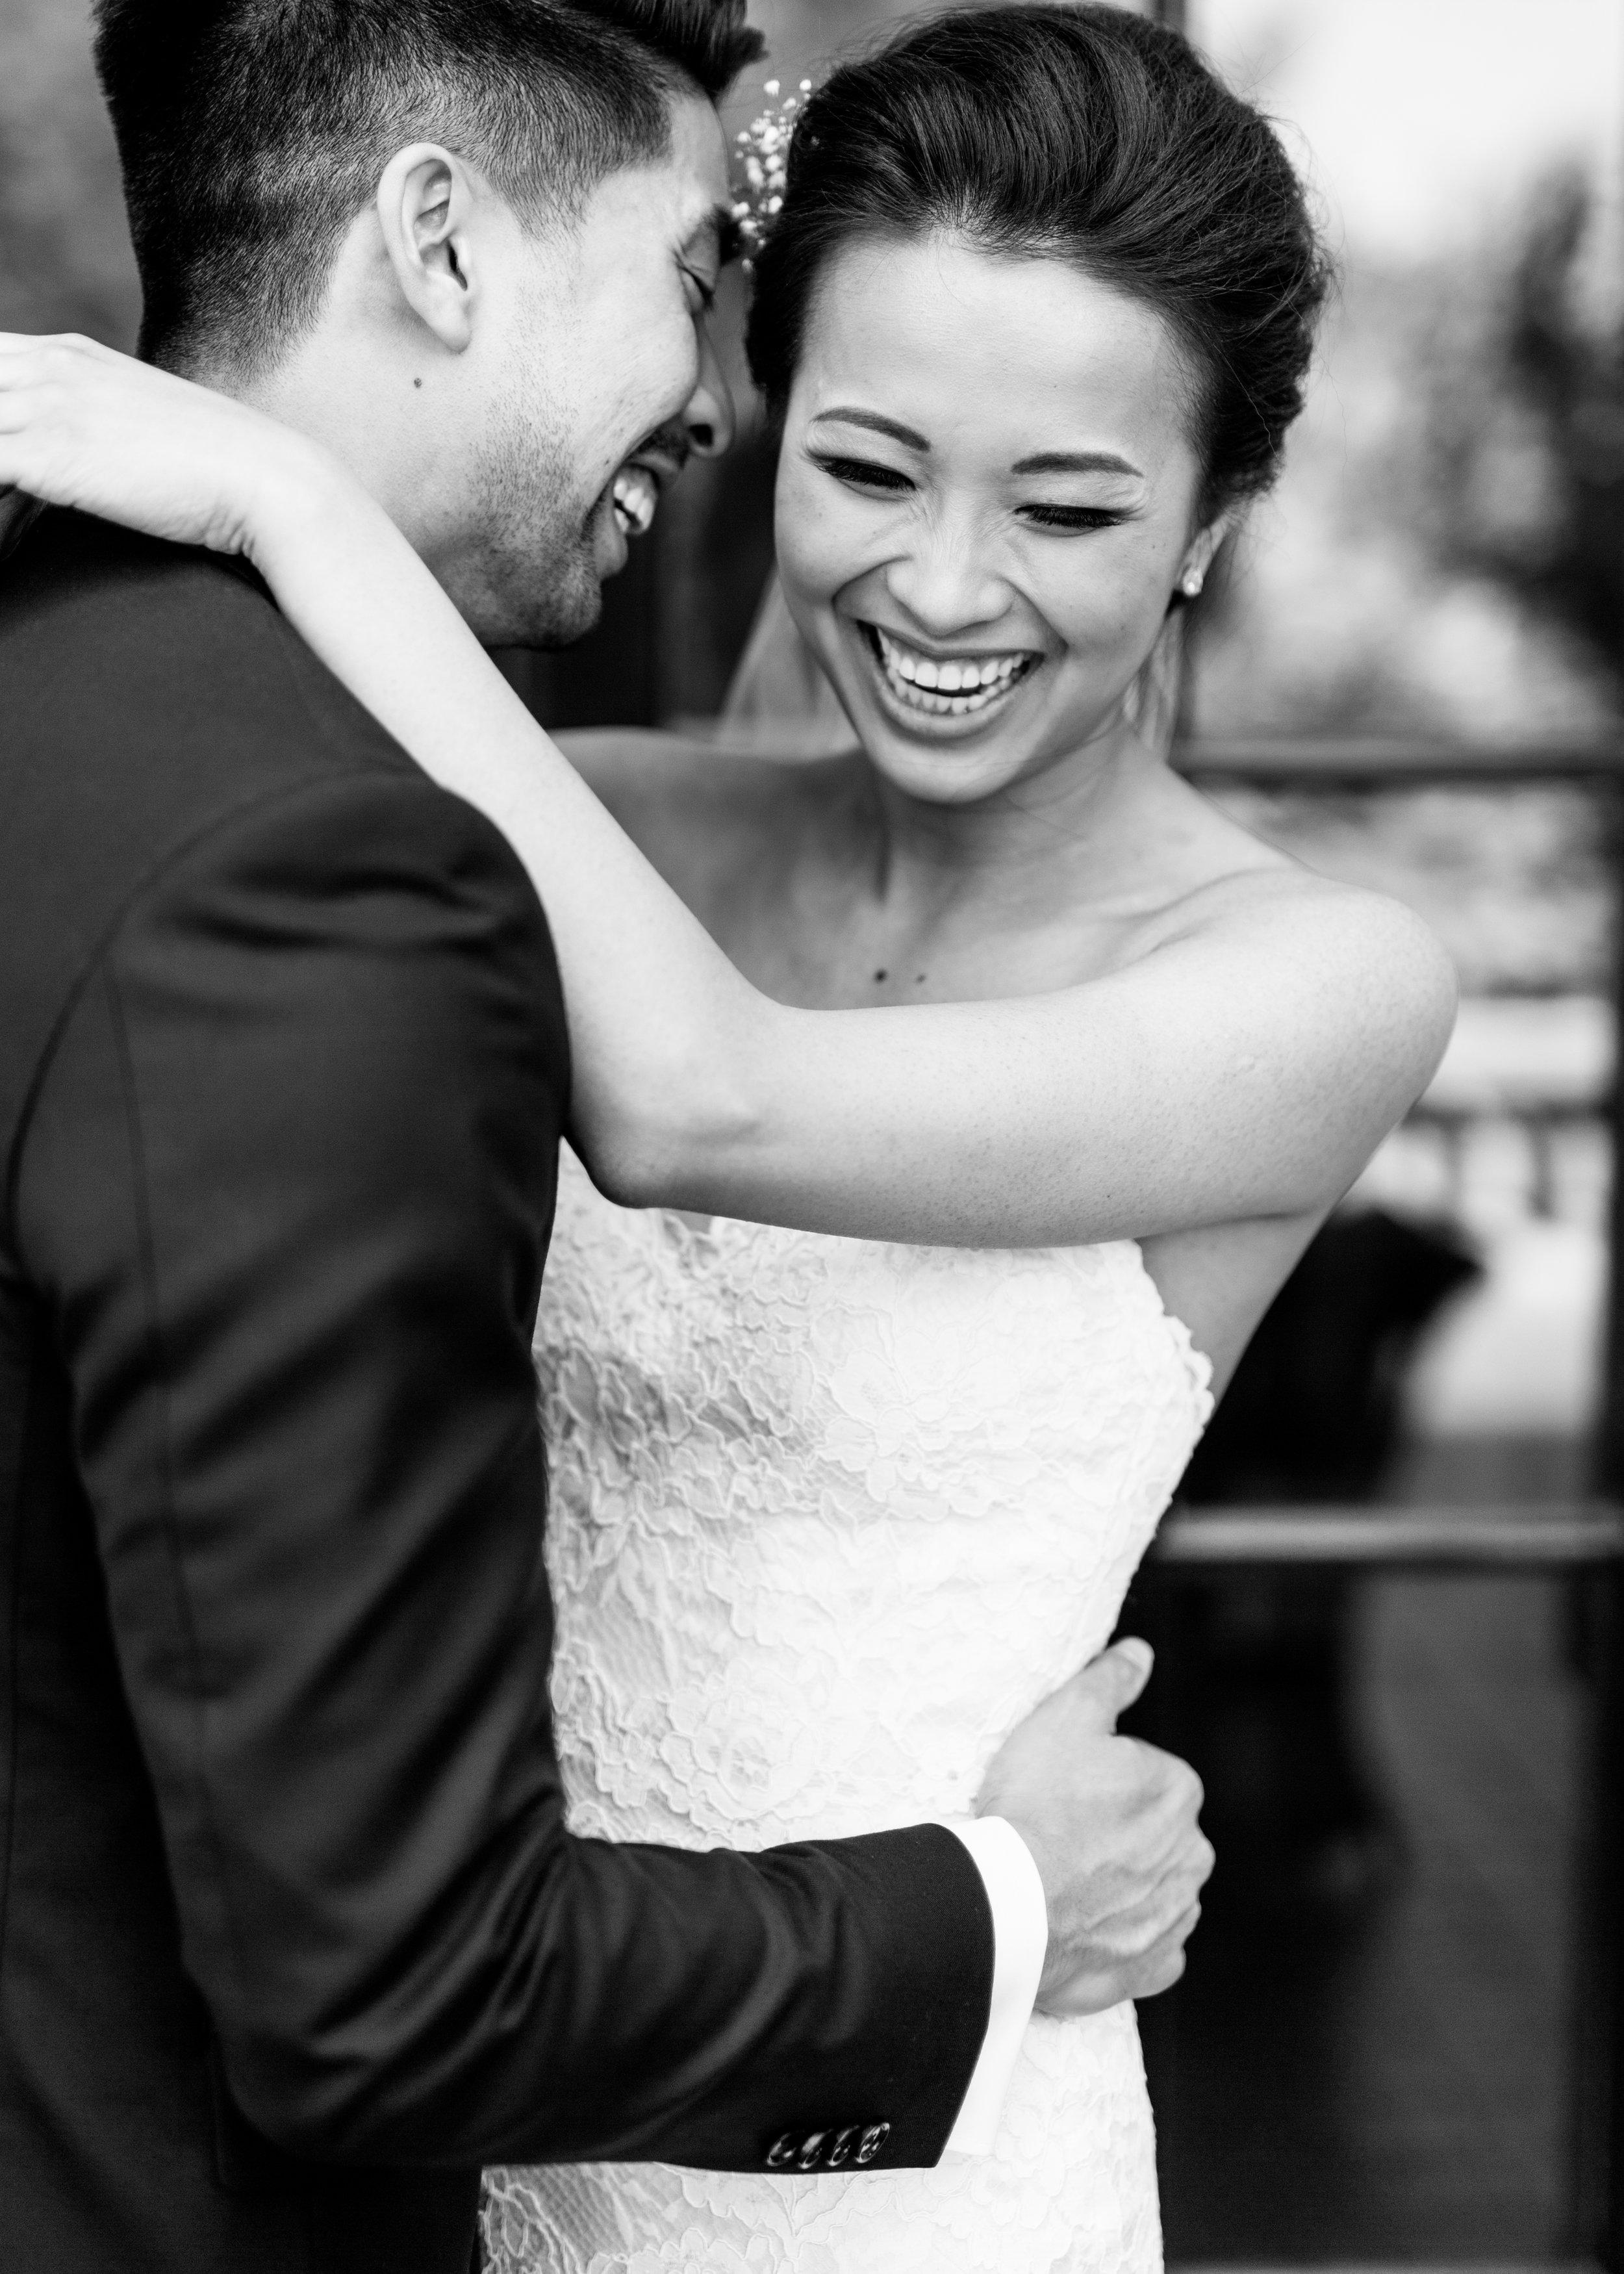 herafilms_wedding_lisa_arthur_hera_selects-54.jpg